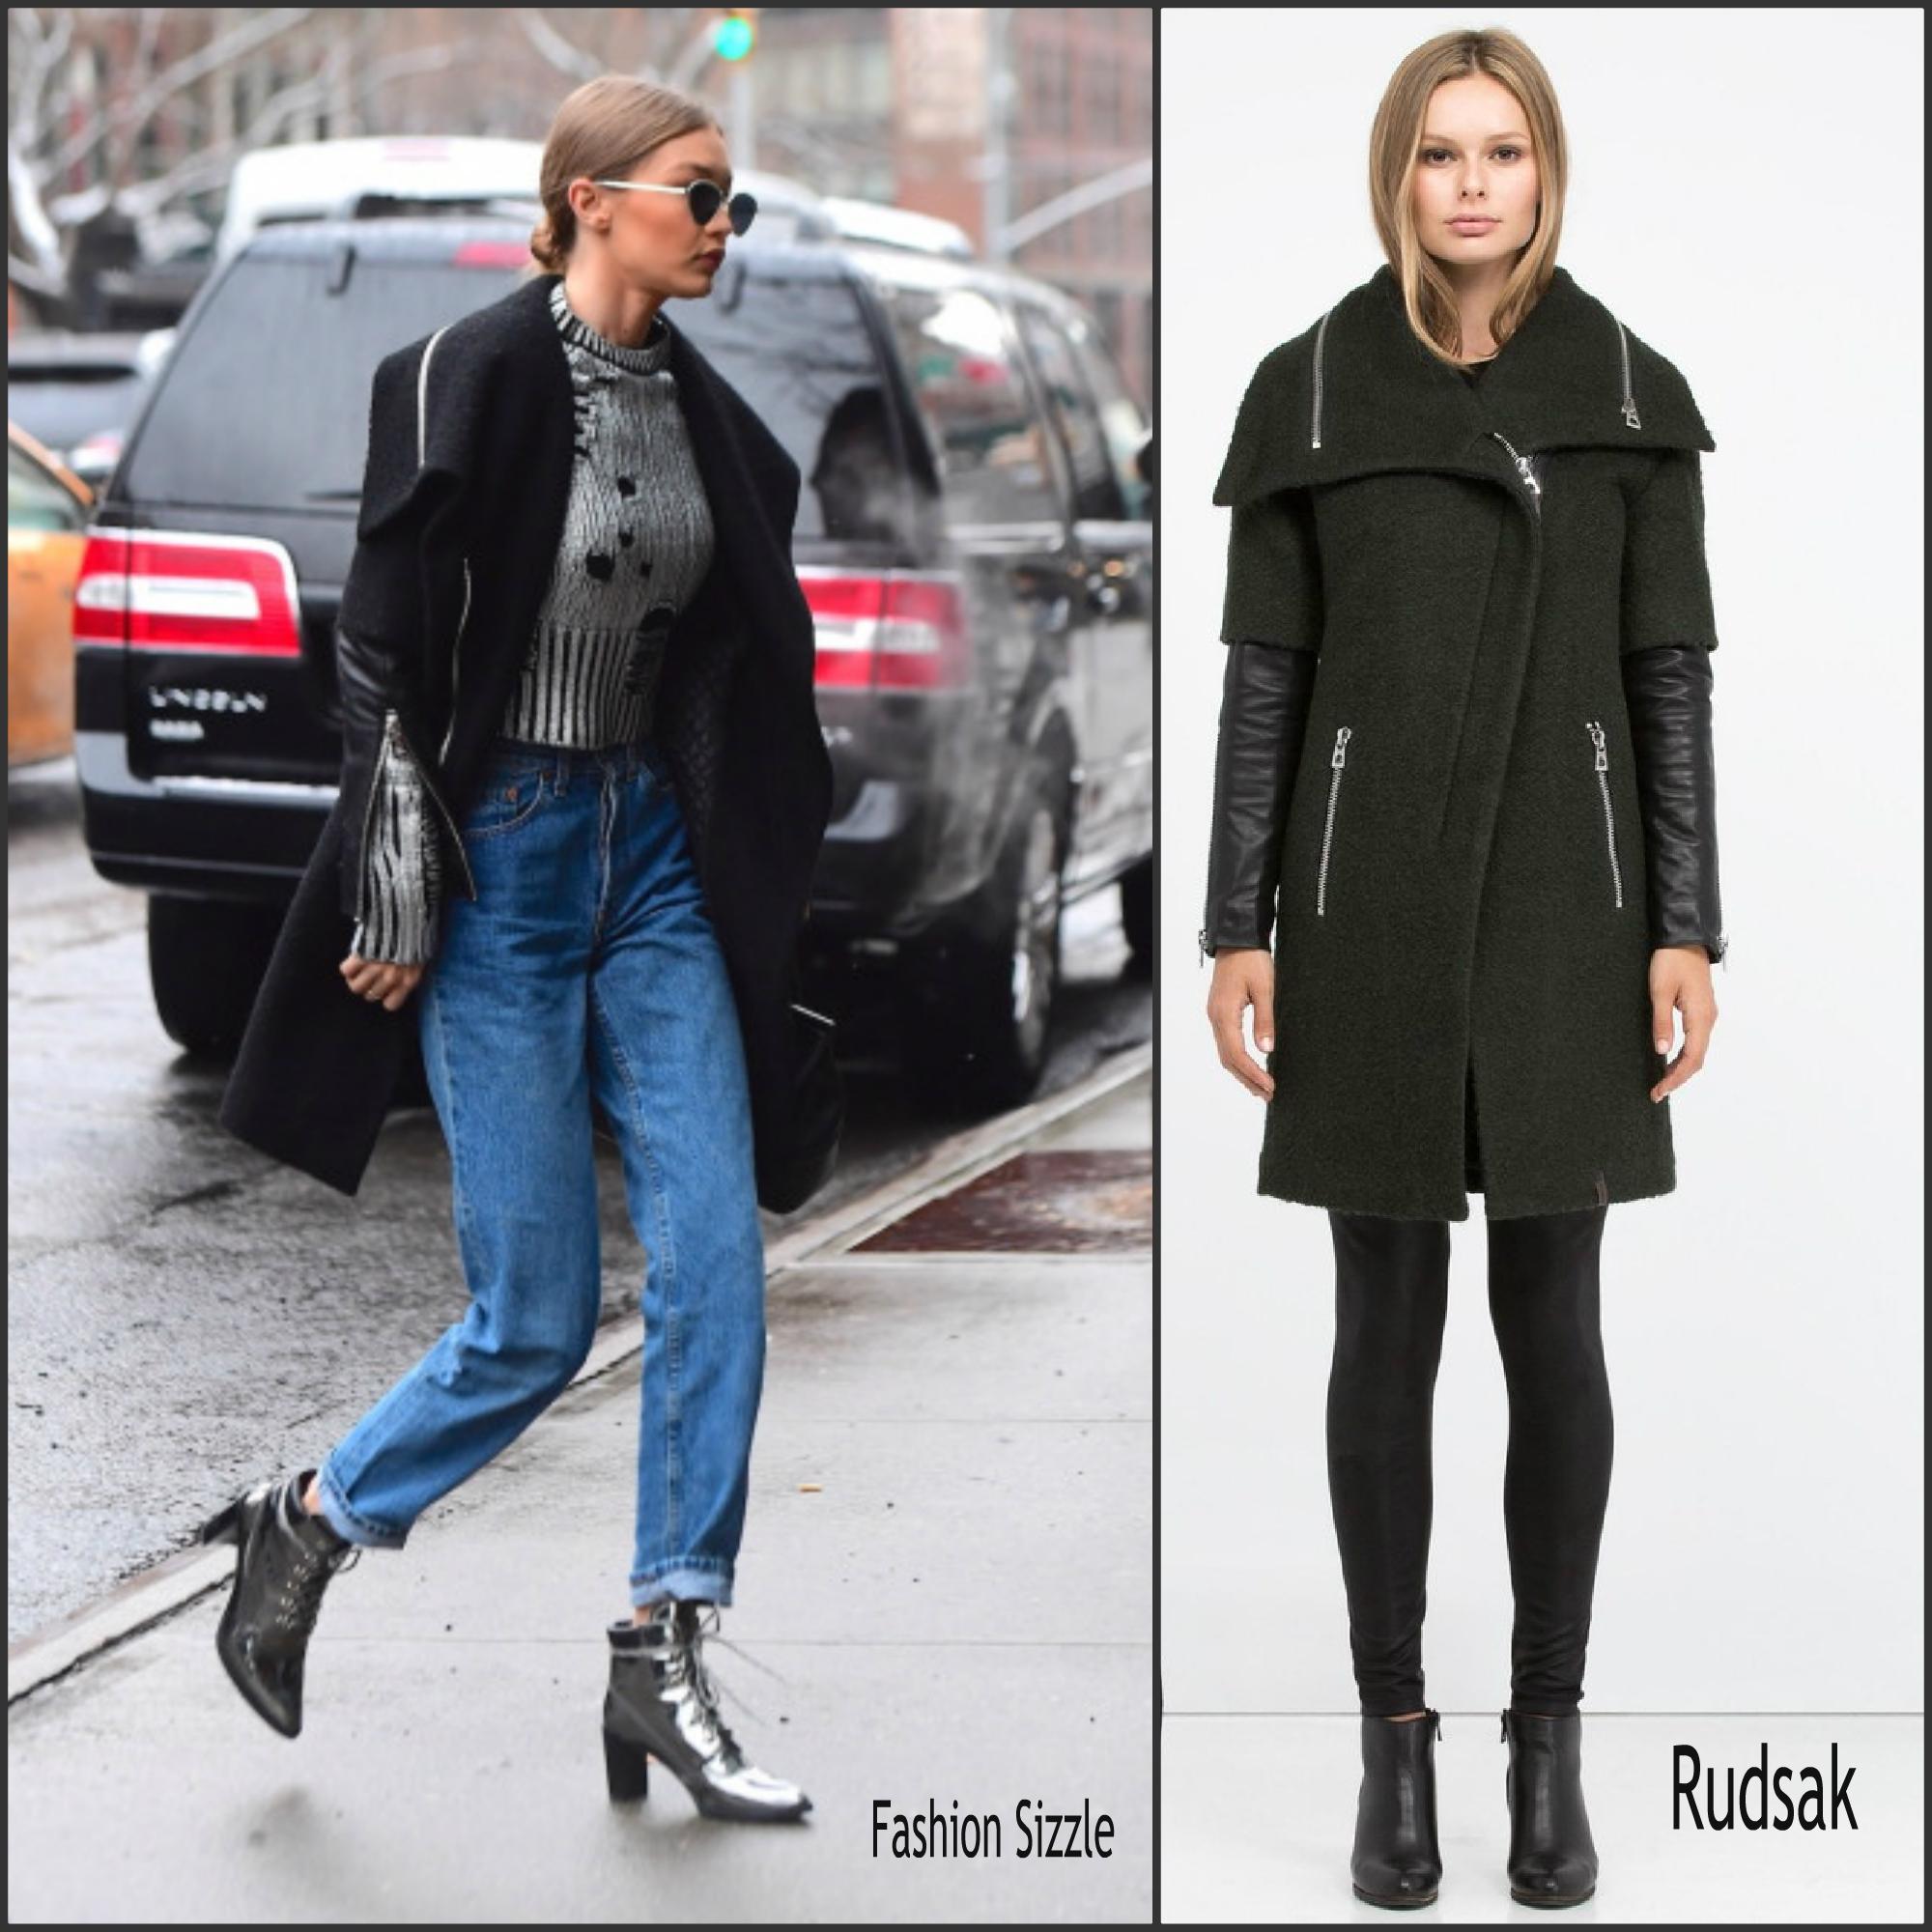 gigi-hadid-in-rudsak-coat-out-in-new-york